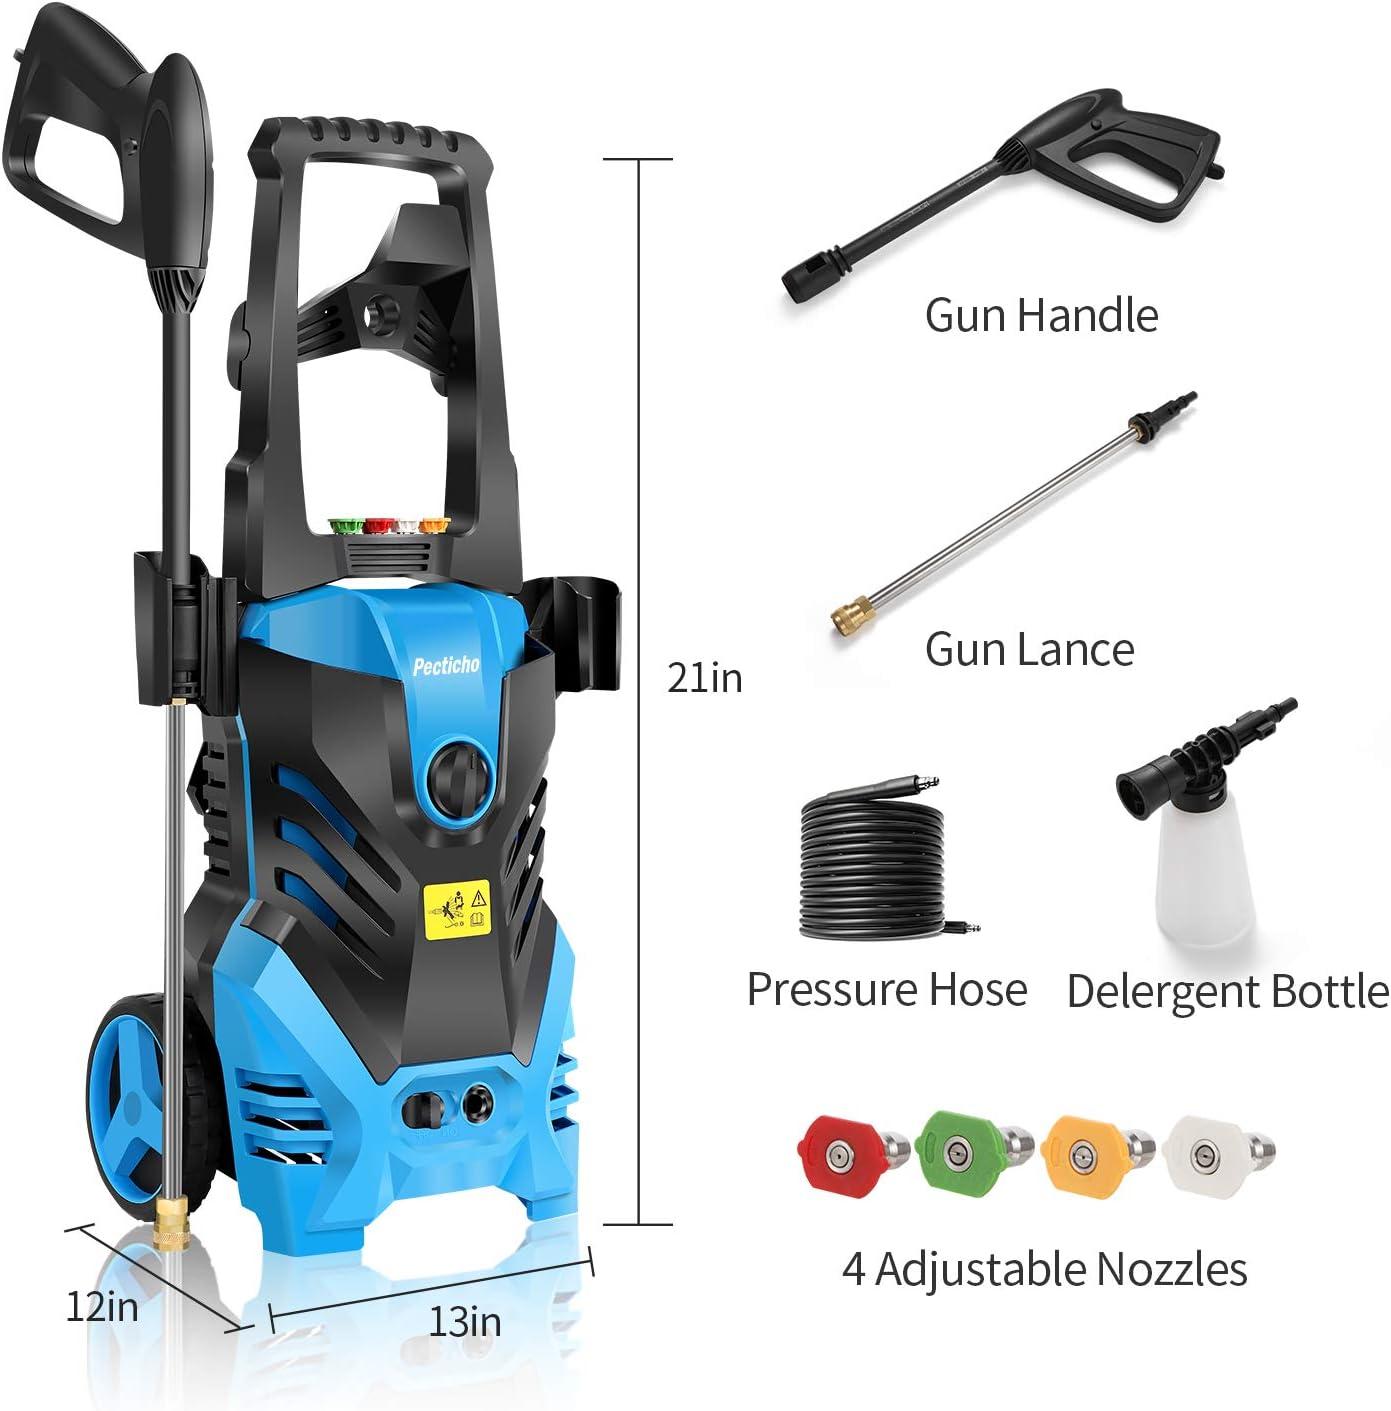 3000PSI 1.8GPM Electric Pressure Washer Home Power Cleaner Machine Sprayer-Blue